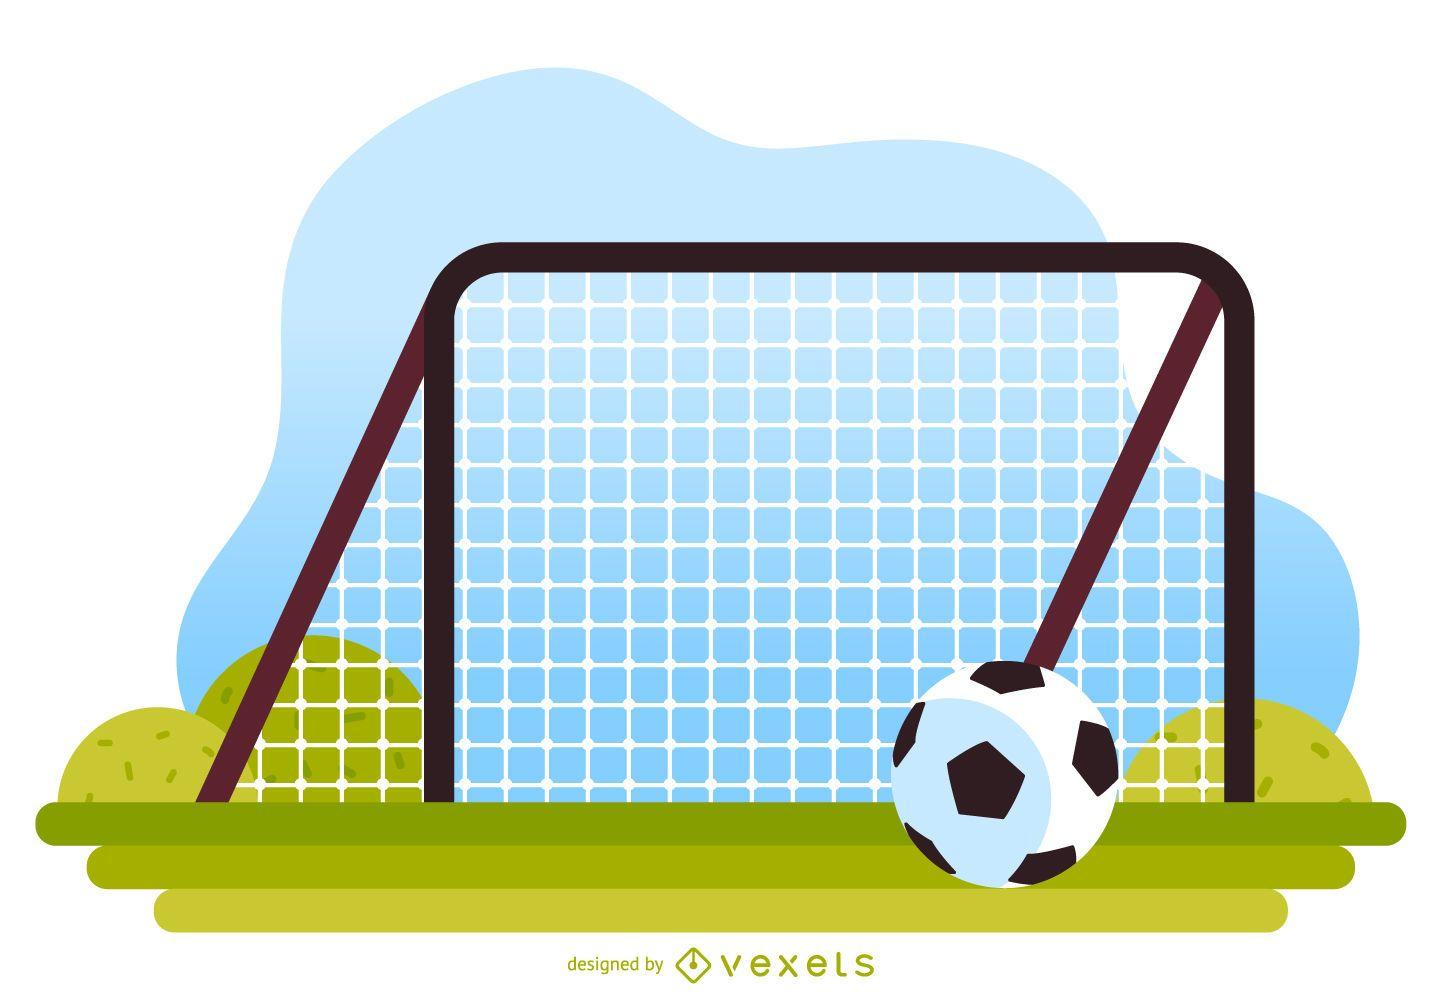 Football kids playground illustration